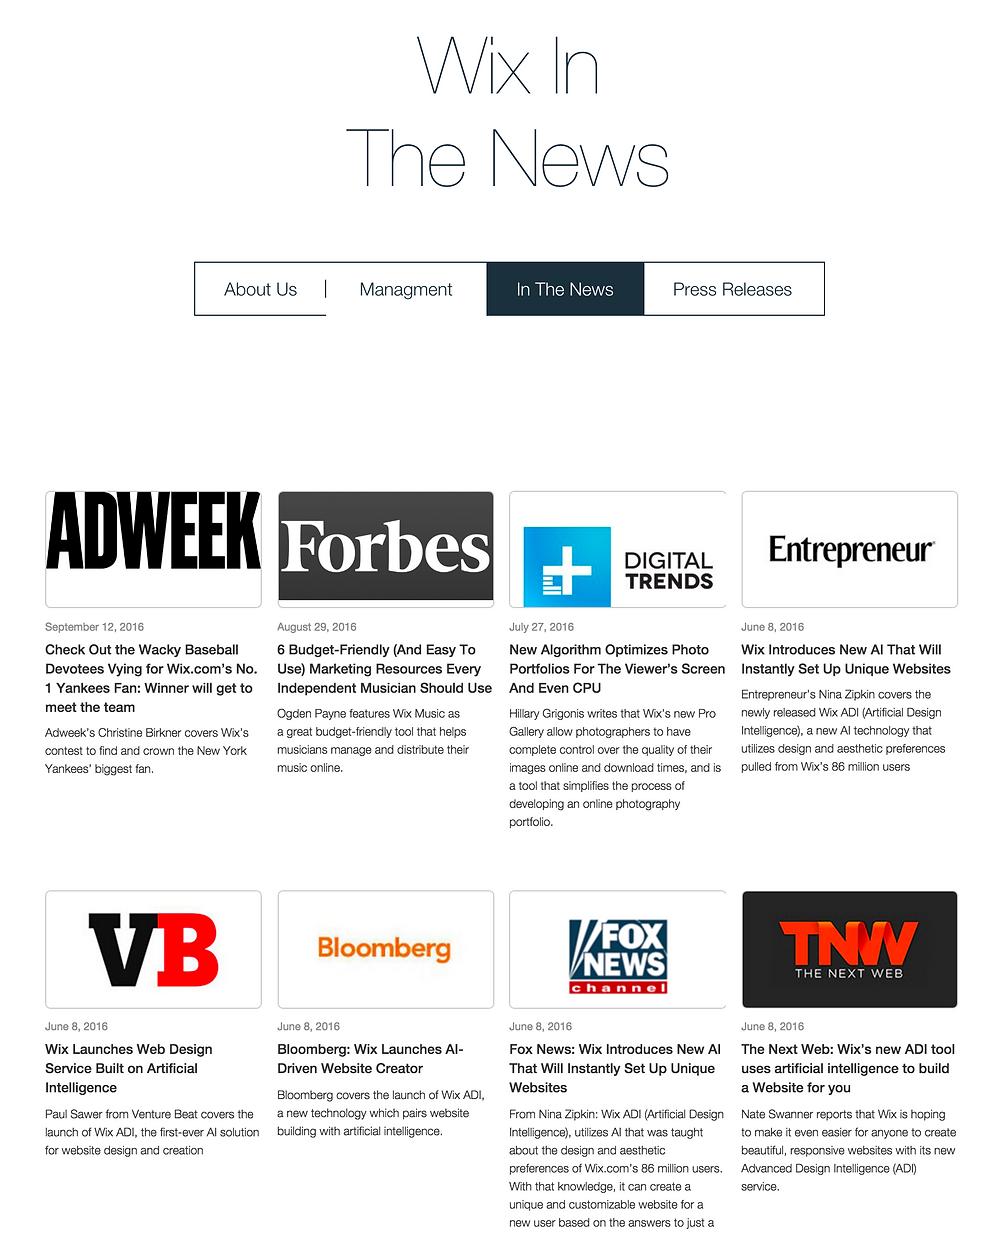 Wix Designer in the News